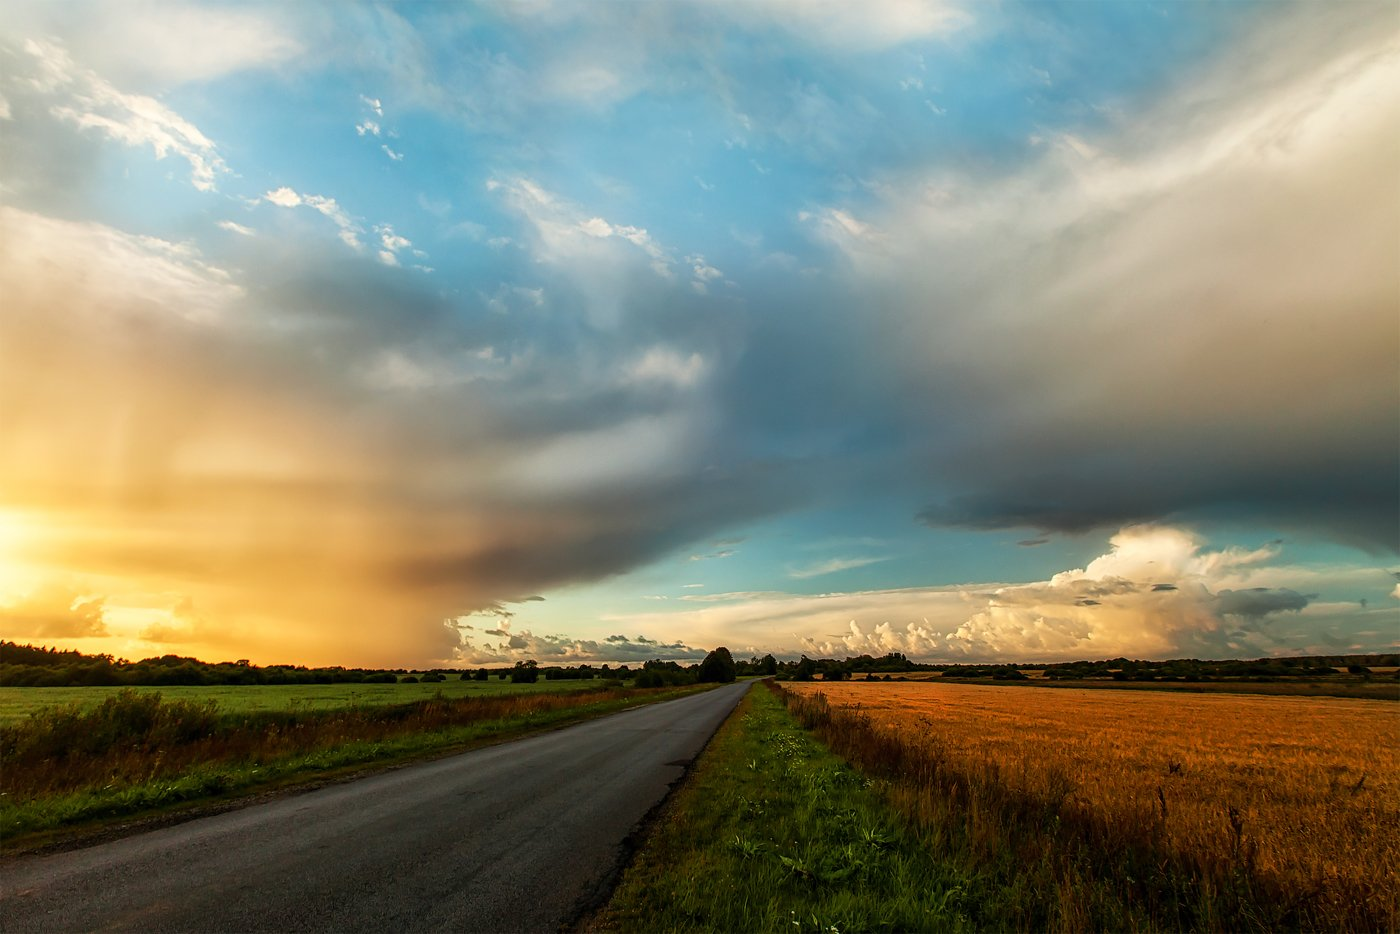 август, ключенков, облака, пейзаж, эстония, Kljuchenkow Aleksandr